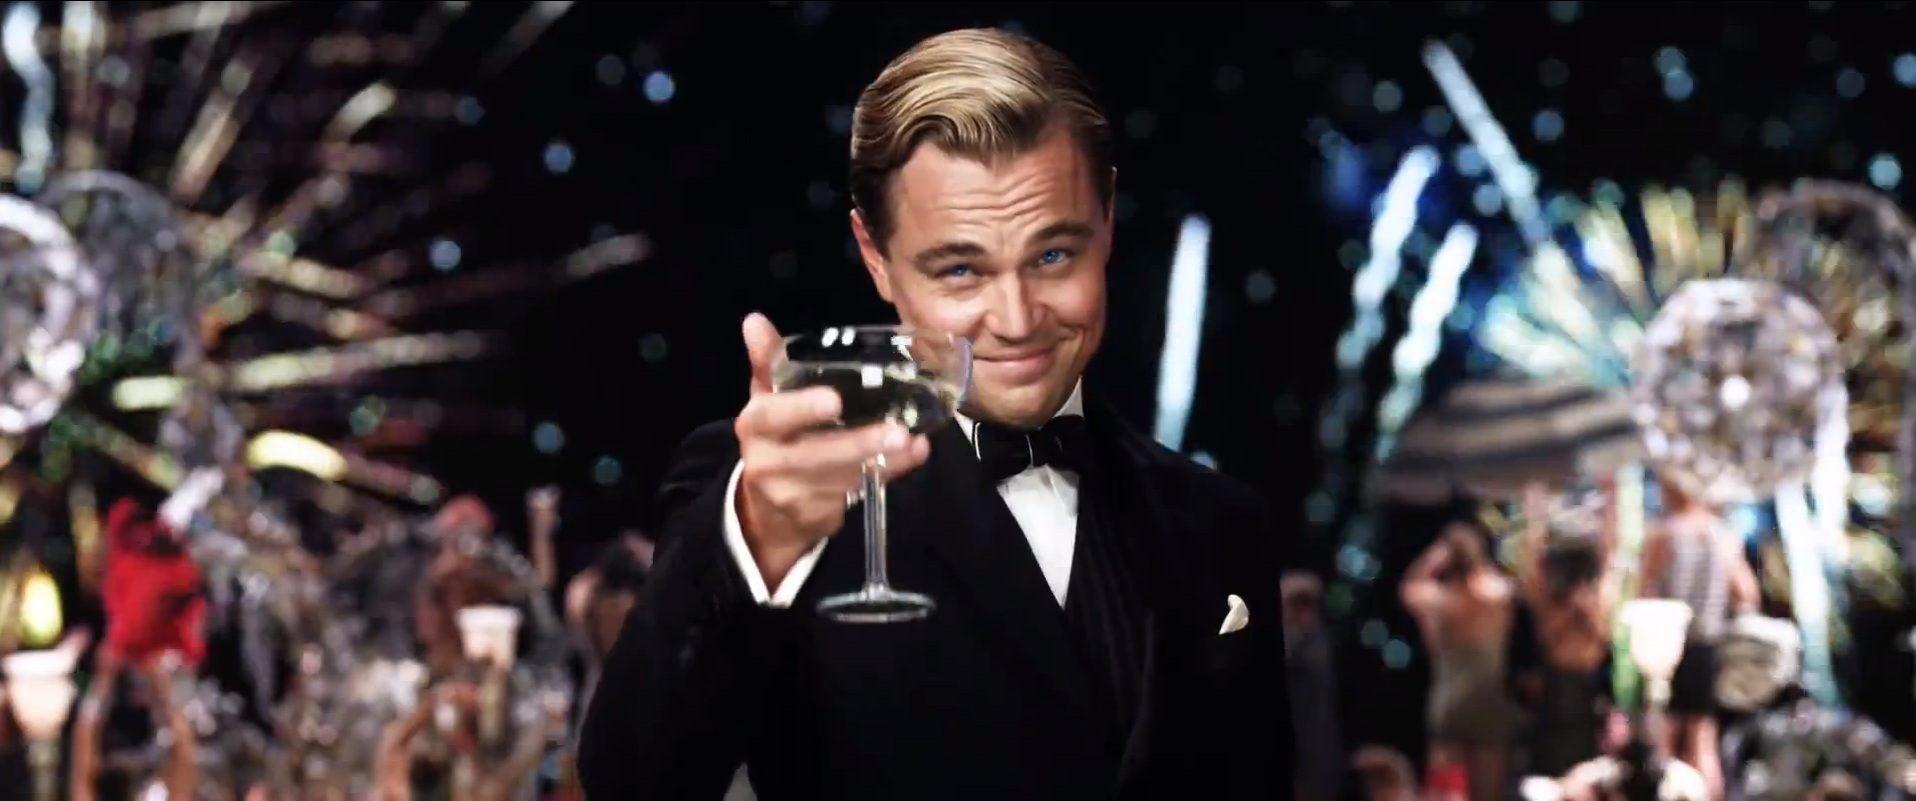 cocktail-grande-gatsby